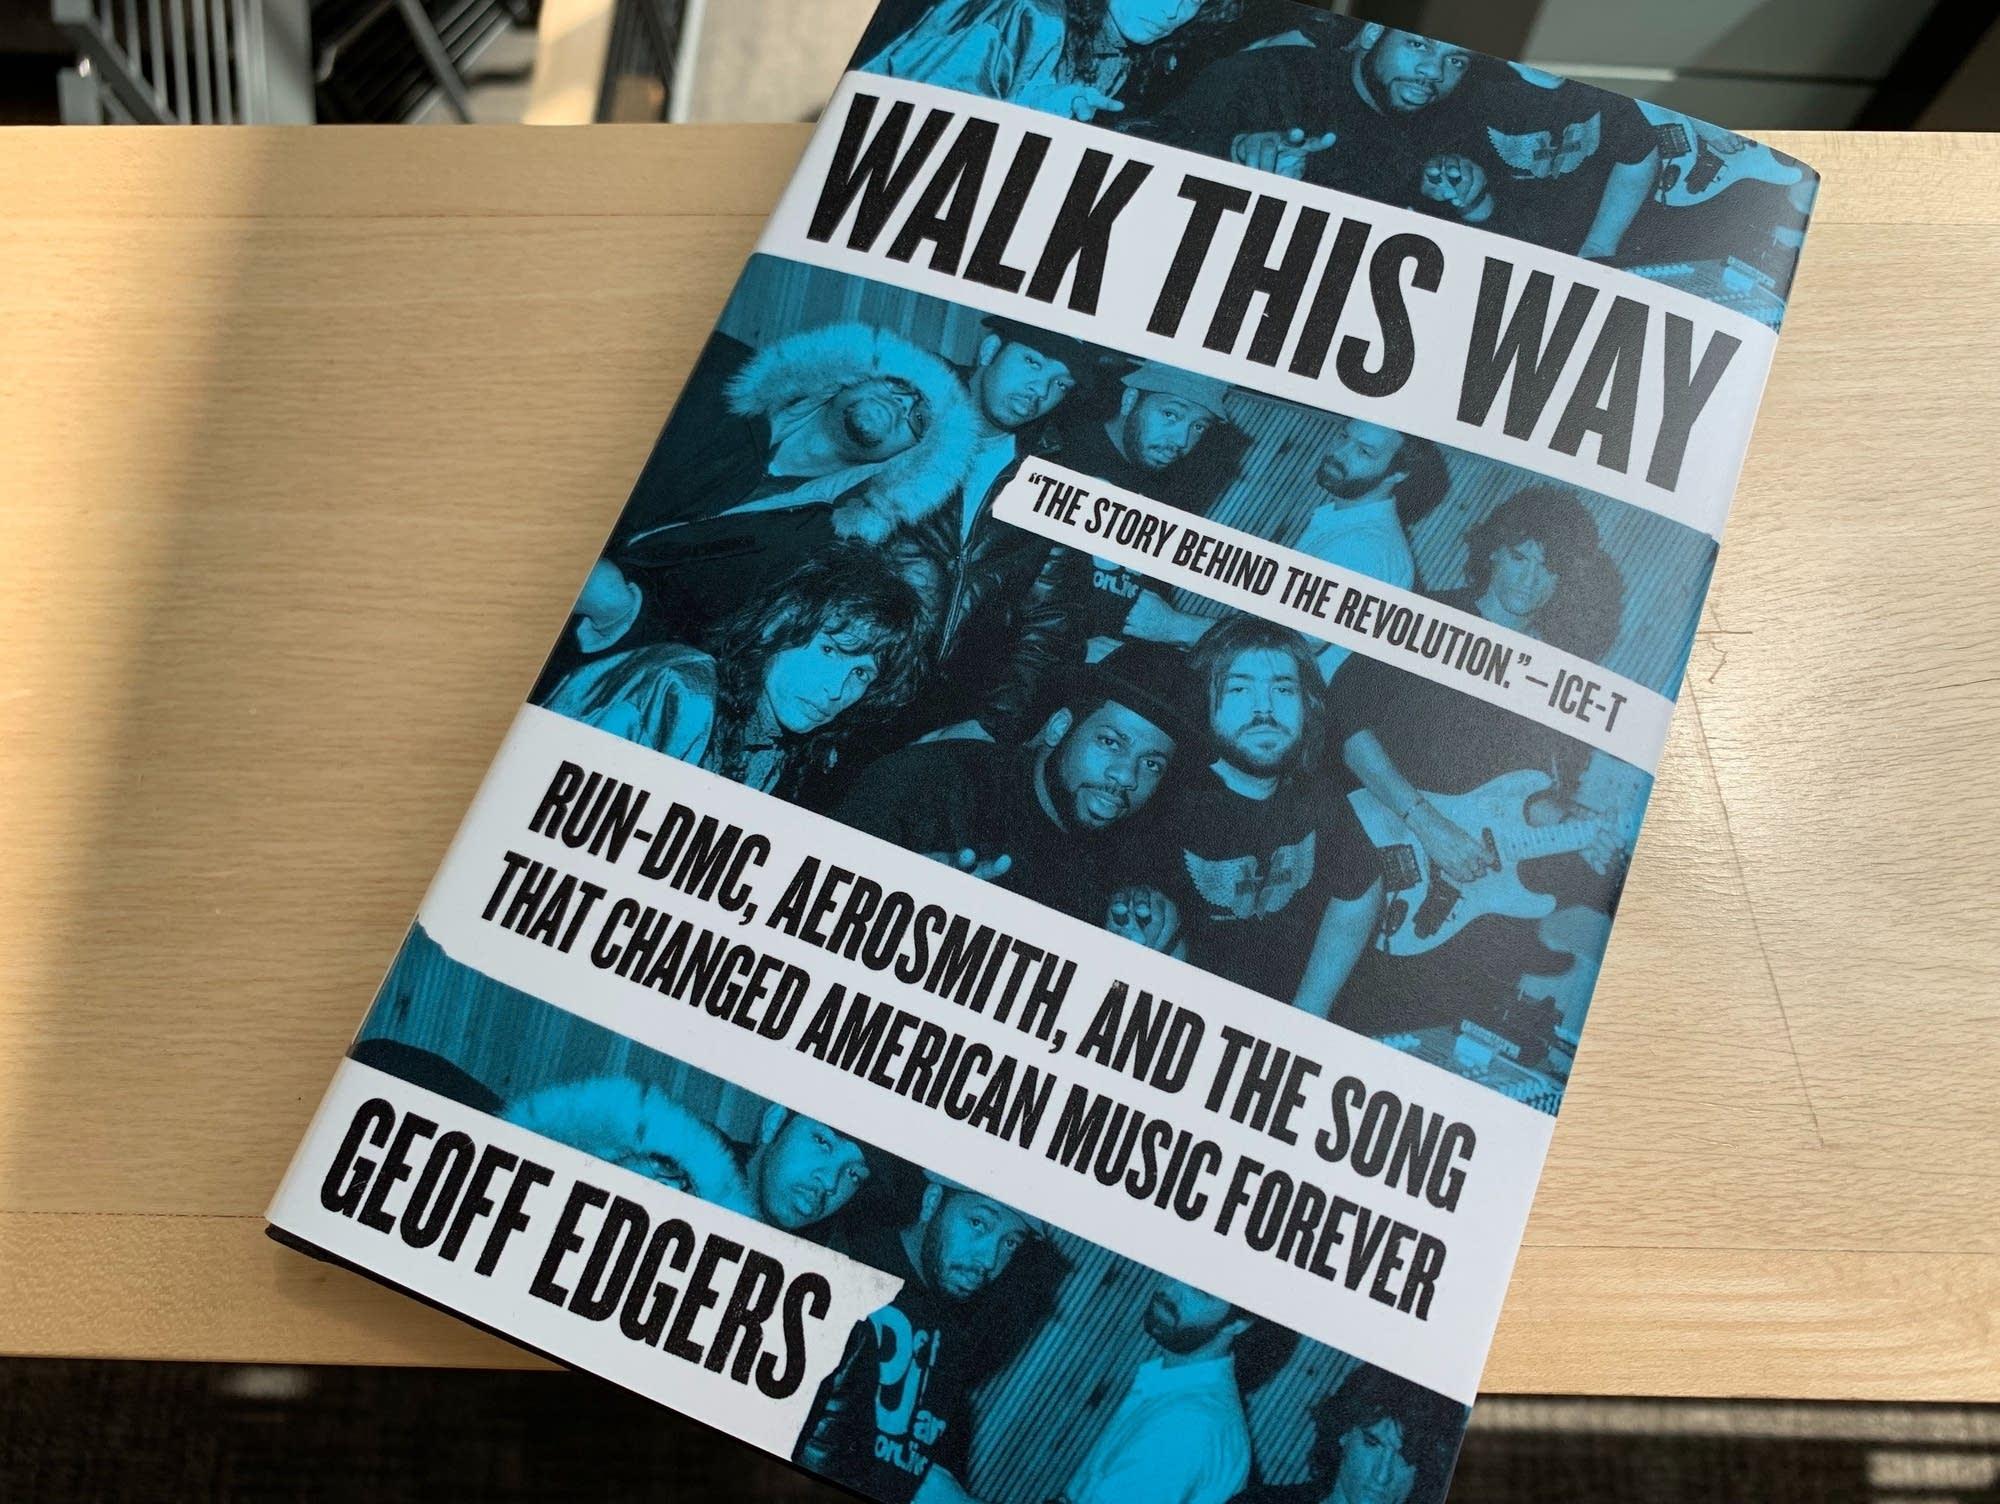 Geoff Edgers's 'Walk This Way.'